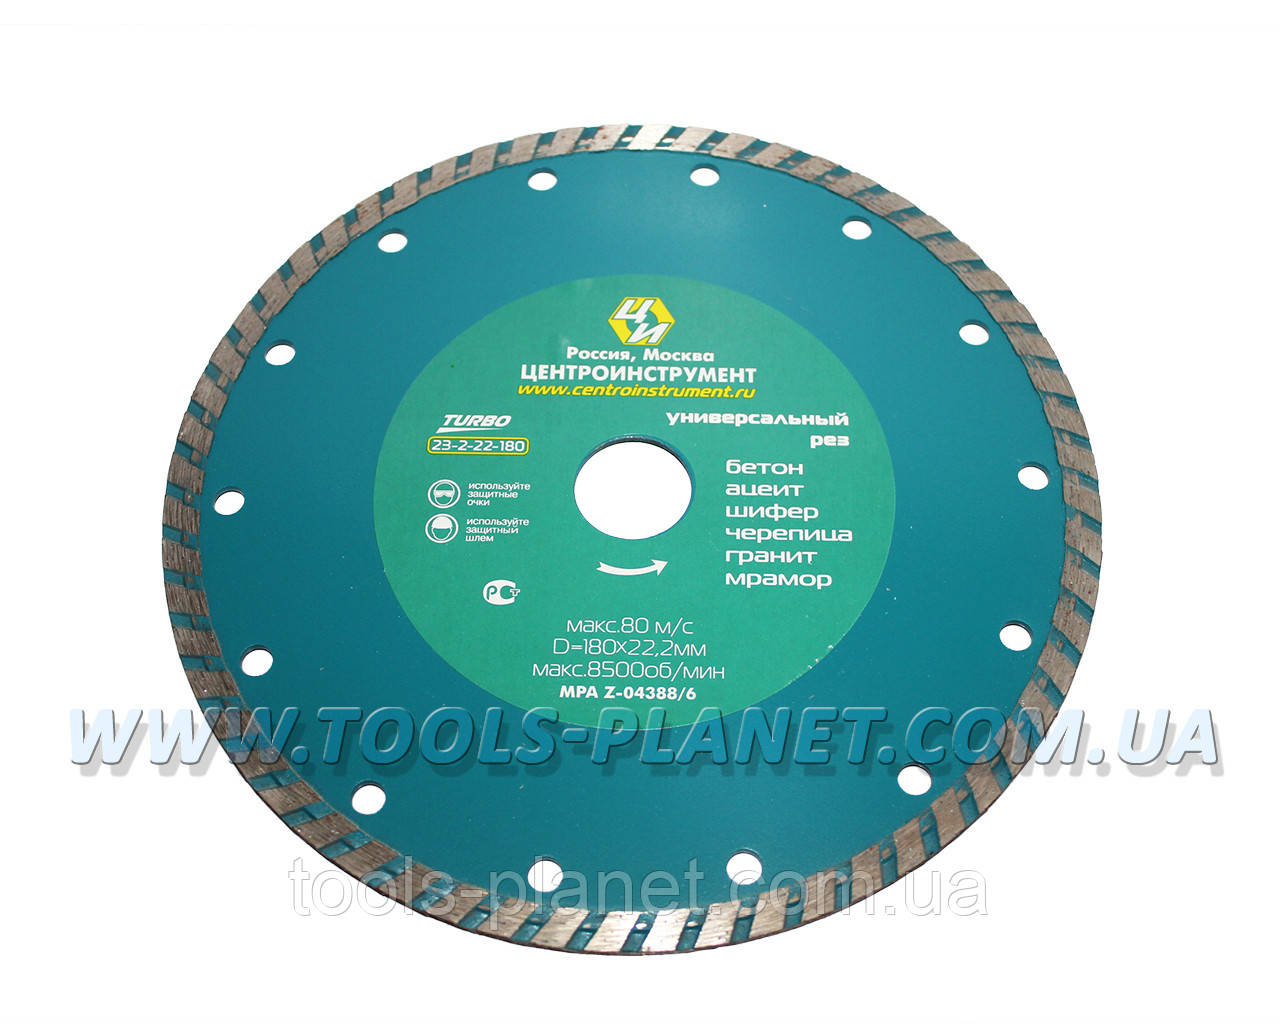 Алмазный диск Центроинструмент 180 х 7 х 22,23 Турбо